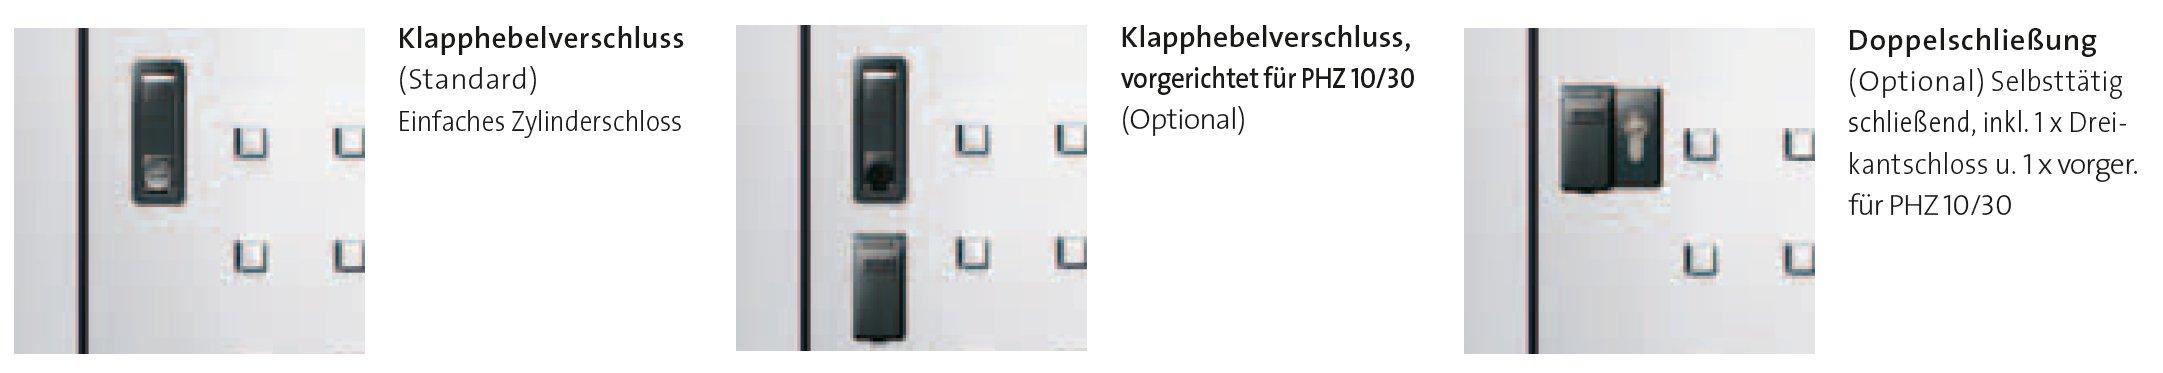 Verschluss-Systeme-Paul-Wolff-Silent